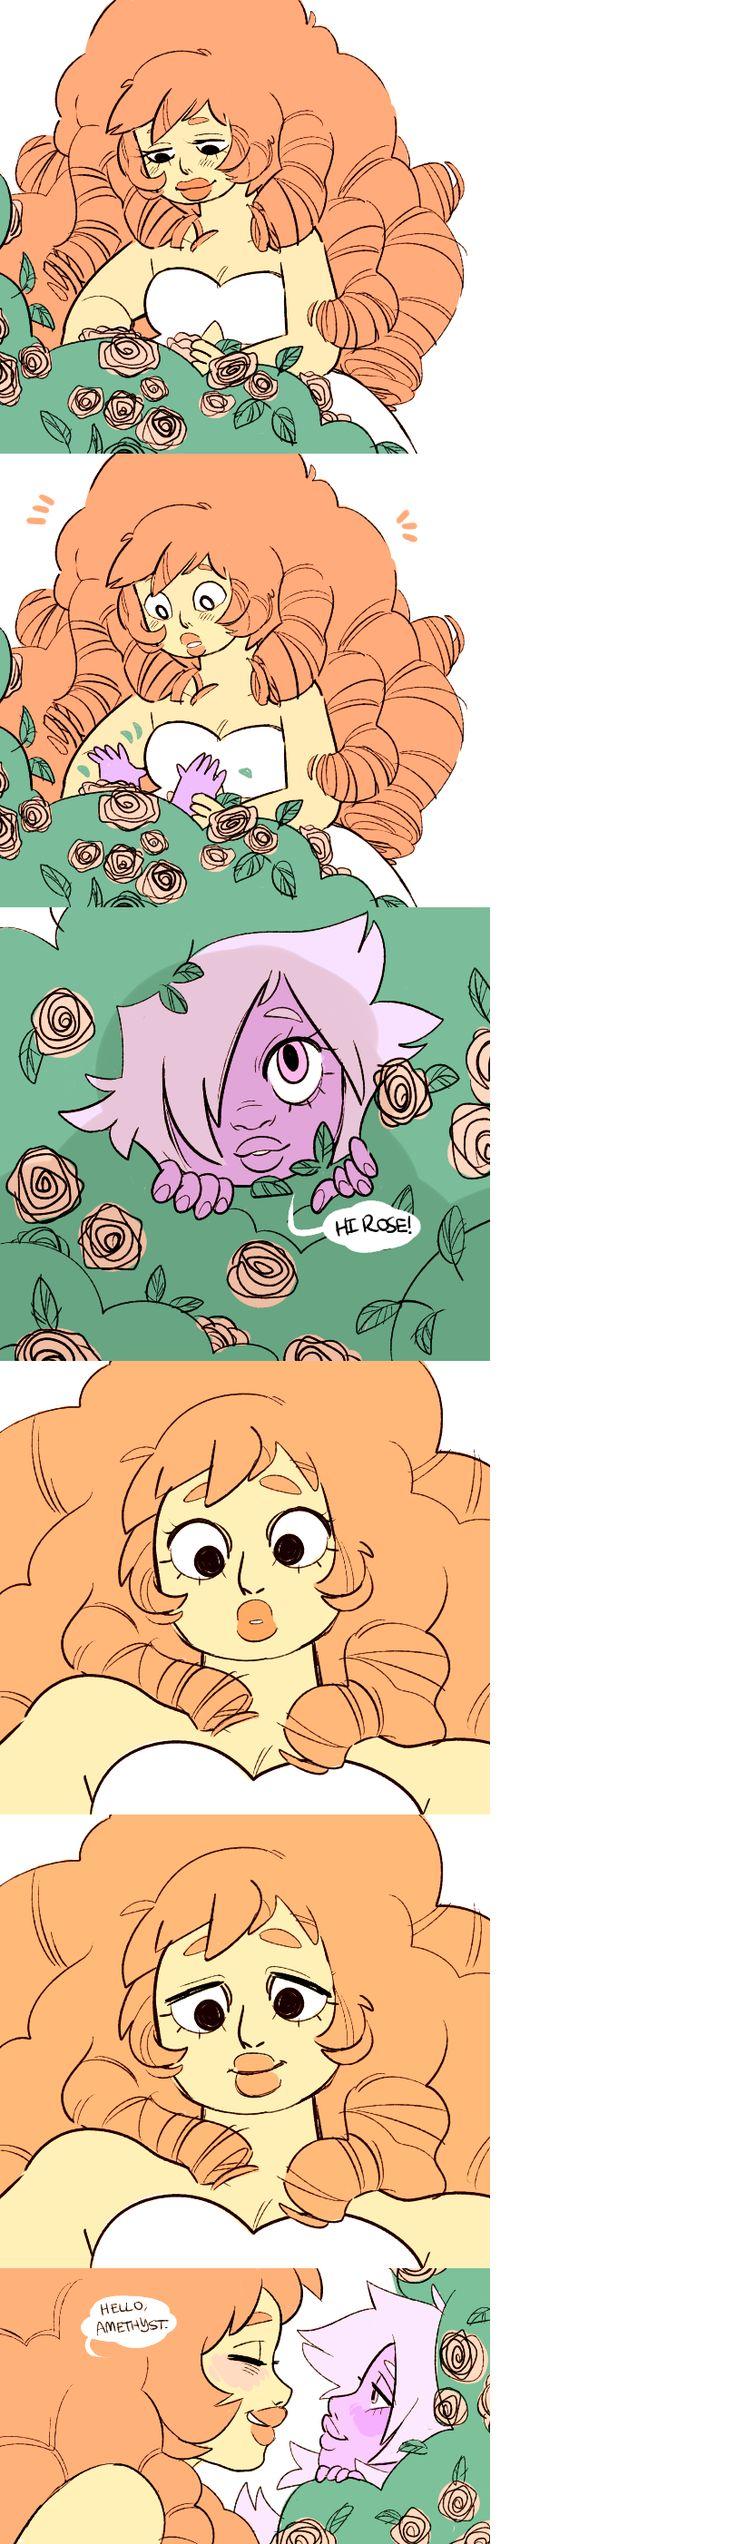 Steven universe,фэндомы,Rose Quartz,SU Персонажи,Amethyst (SU),SU comics